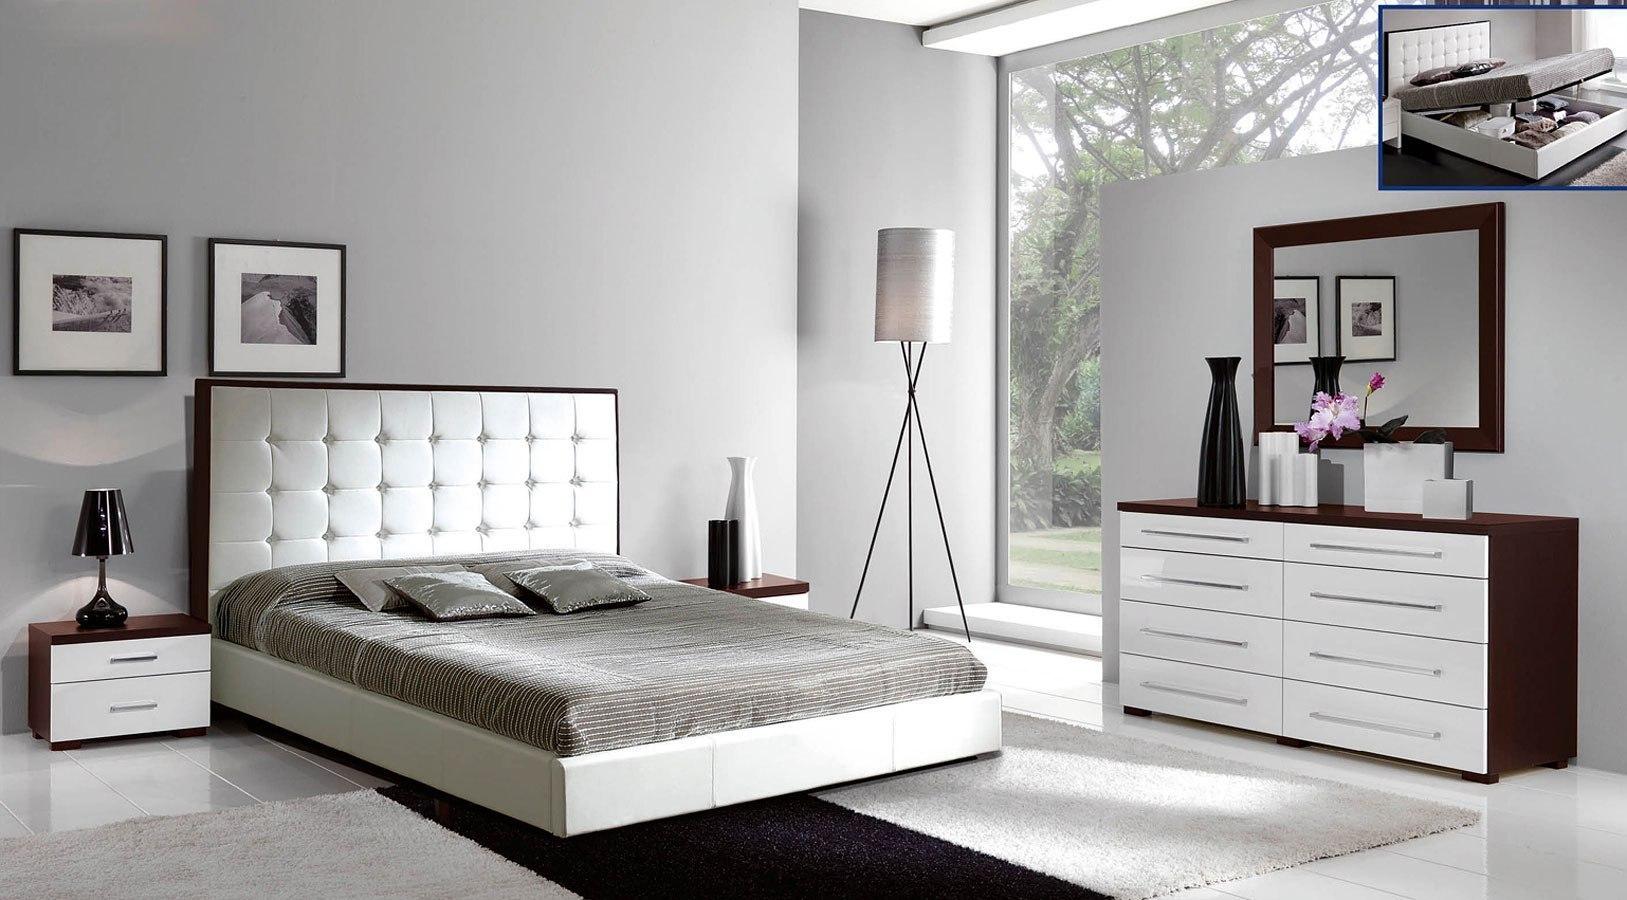 Luxury Bedroom Set w/ Penelope Storage Bed - Bedroom Furniture - Bedroom